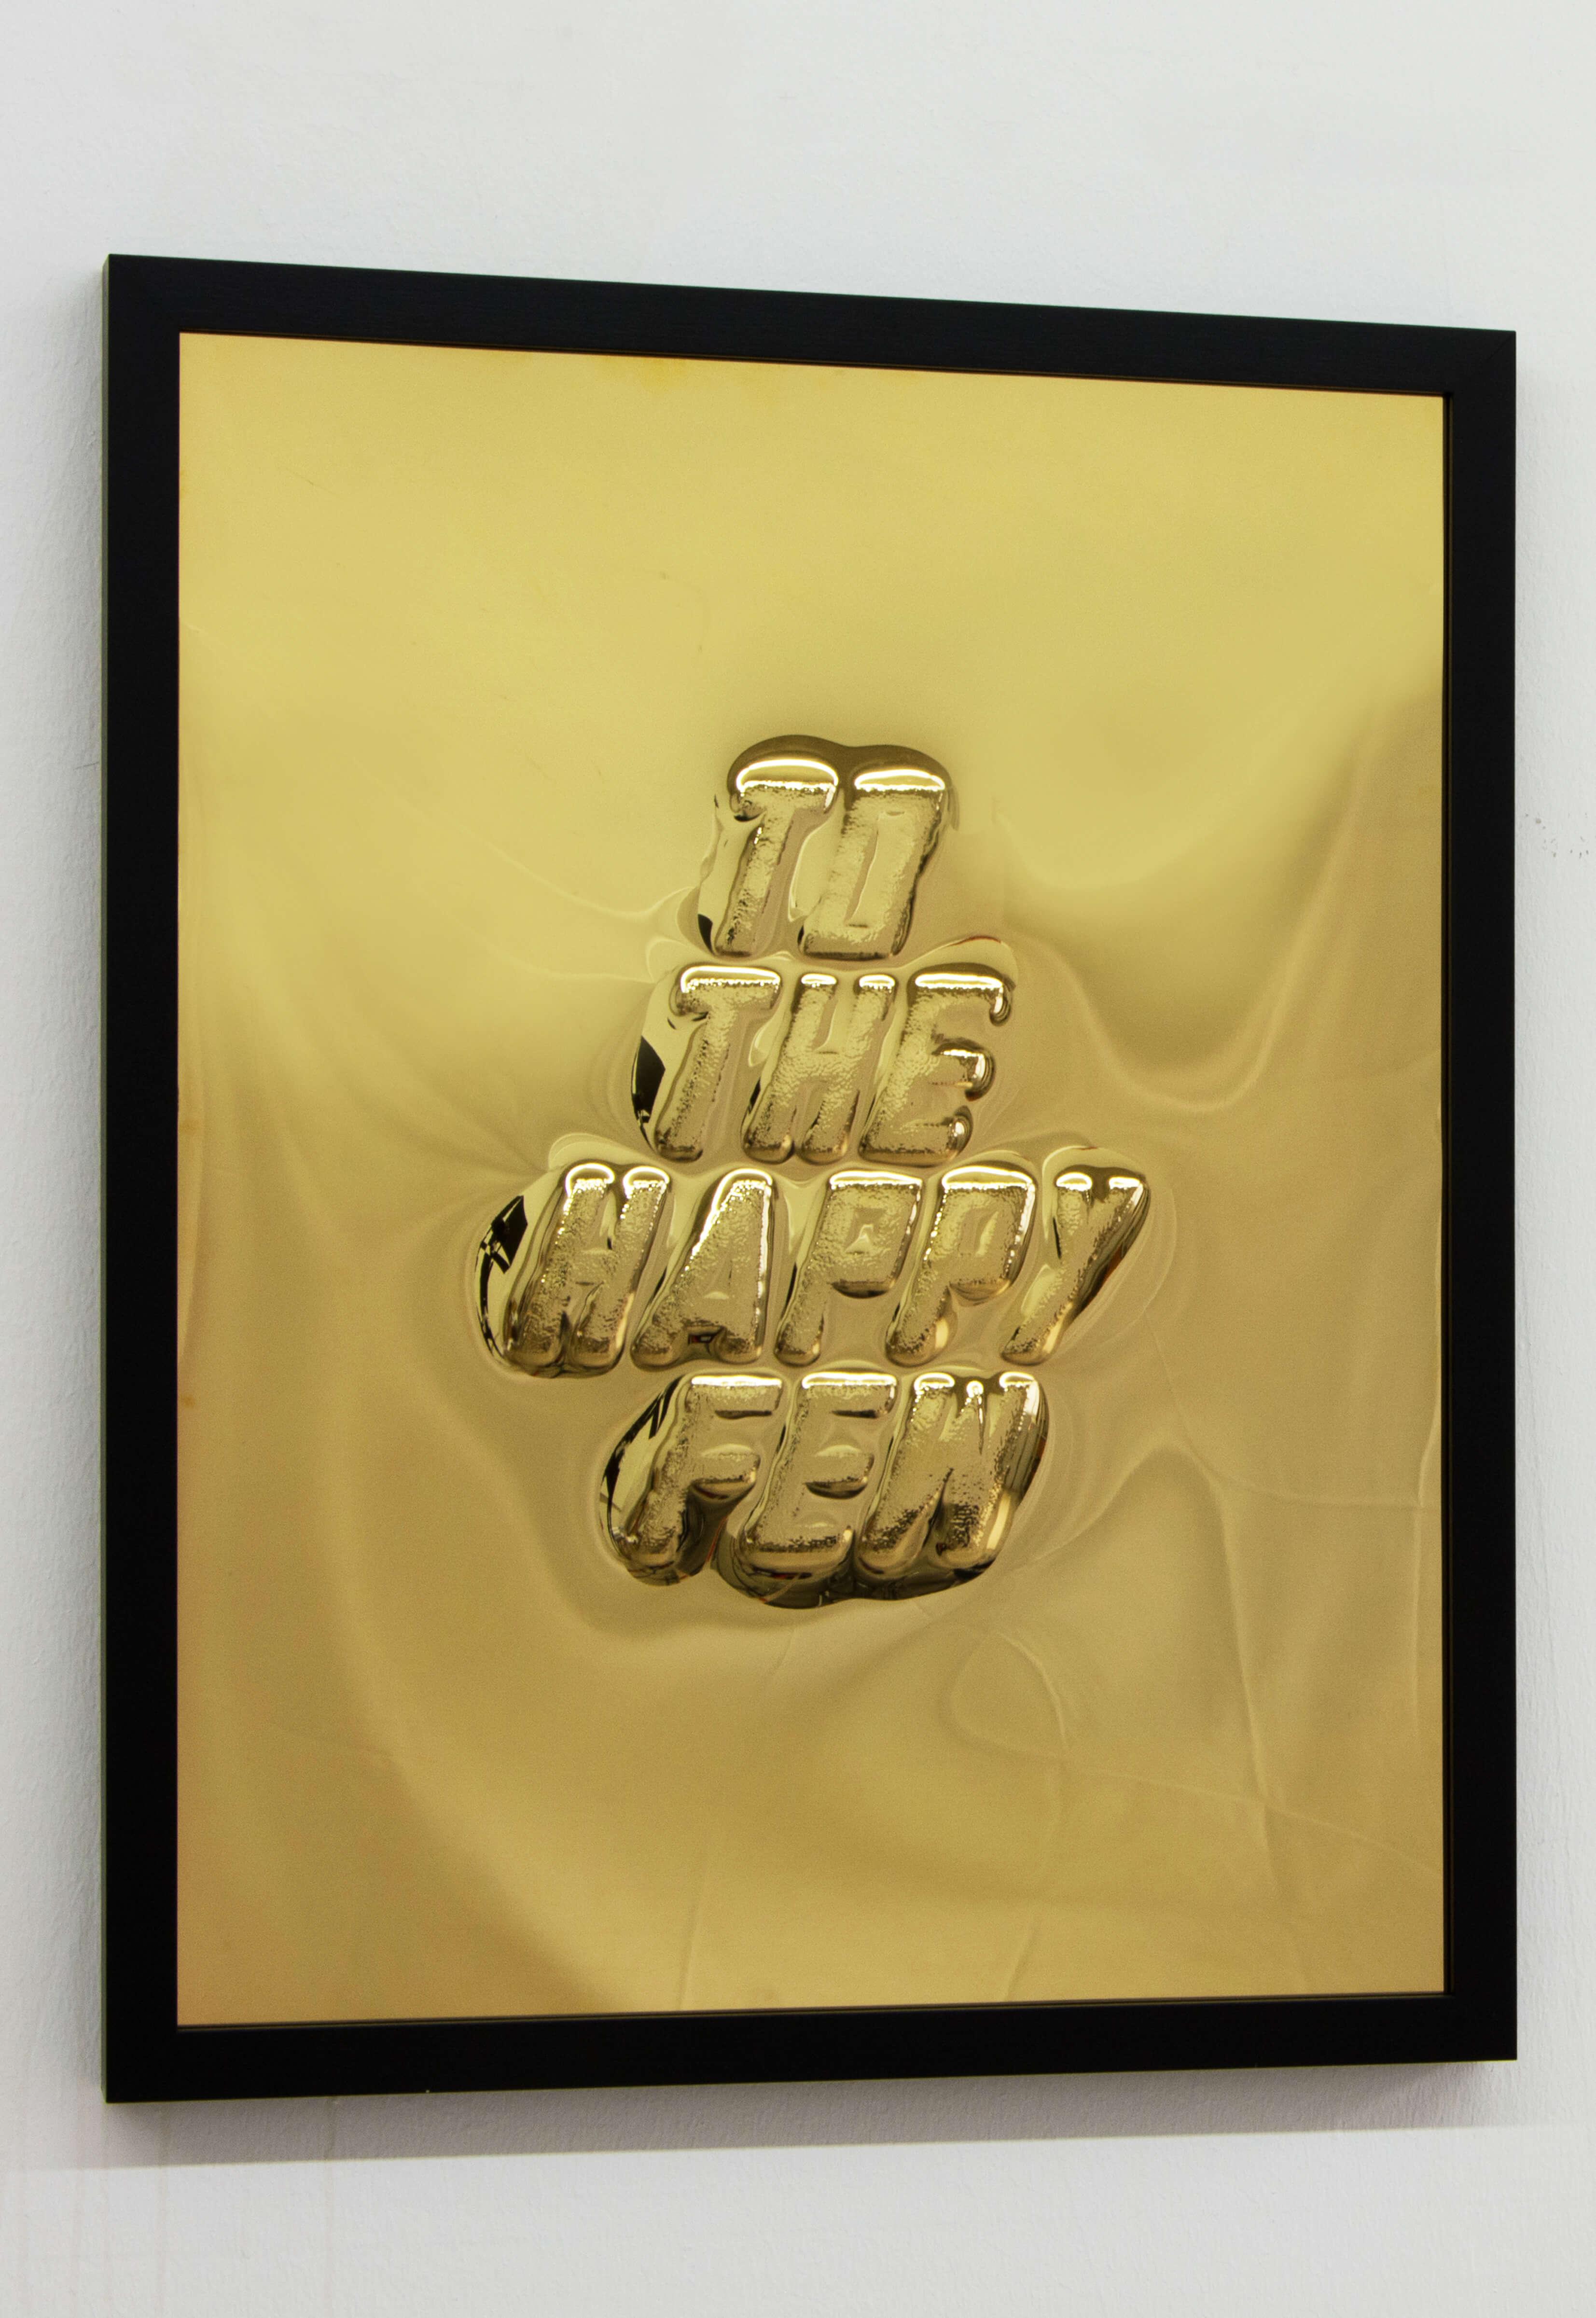 Lars Breuer To The Happy Few vergoldetes Messing 2015 Addaux Artist Bielefeld Berlin Düsseldorf Grafik Schrift Galerie